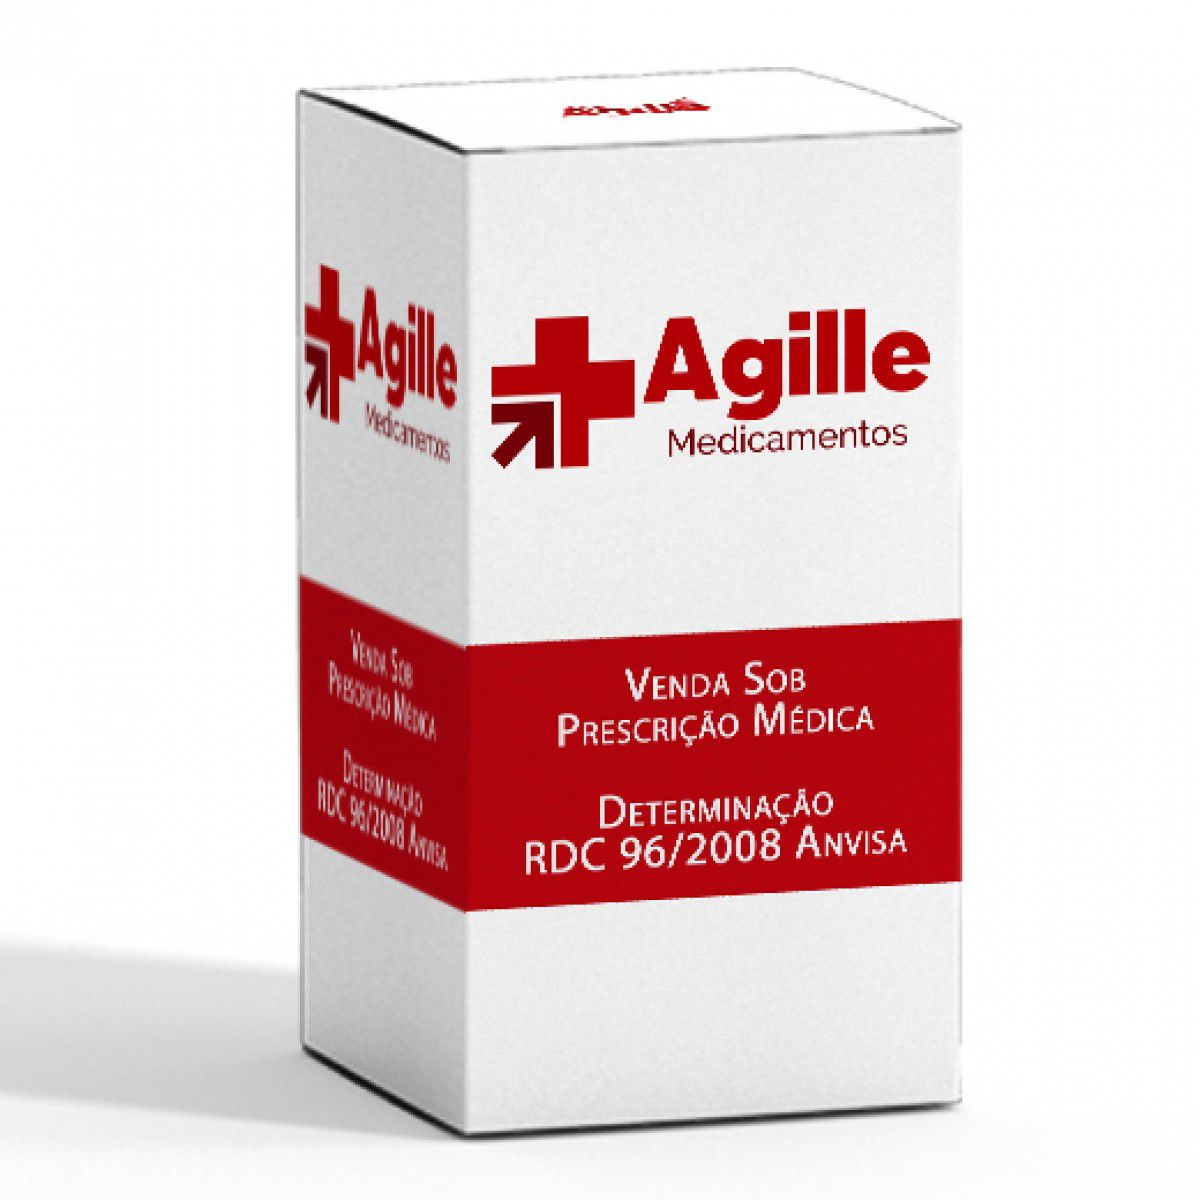 EPREX 2000UI SOL INJ 6 SER PREENCH X 0,5ML+1 DISP  - Agille Speciality